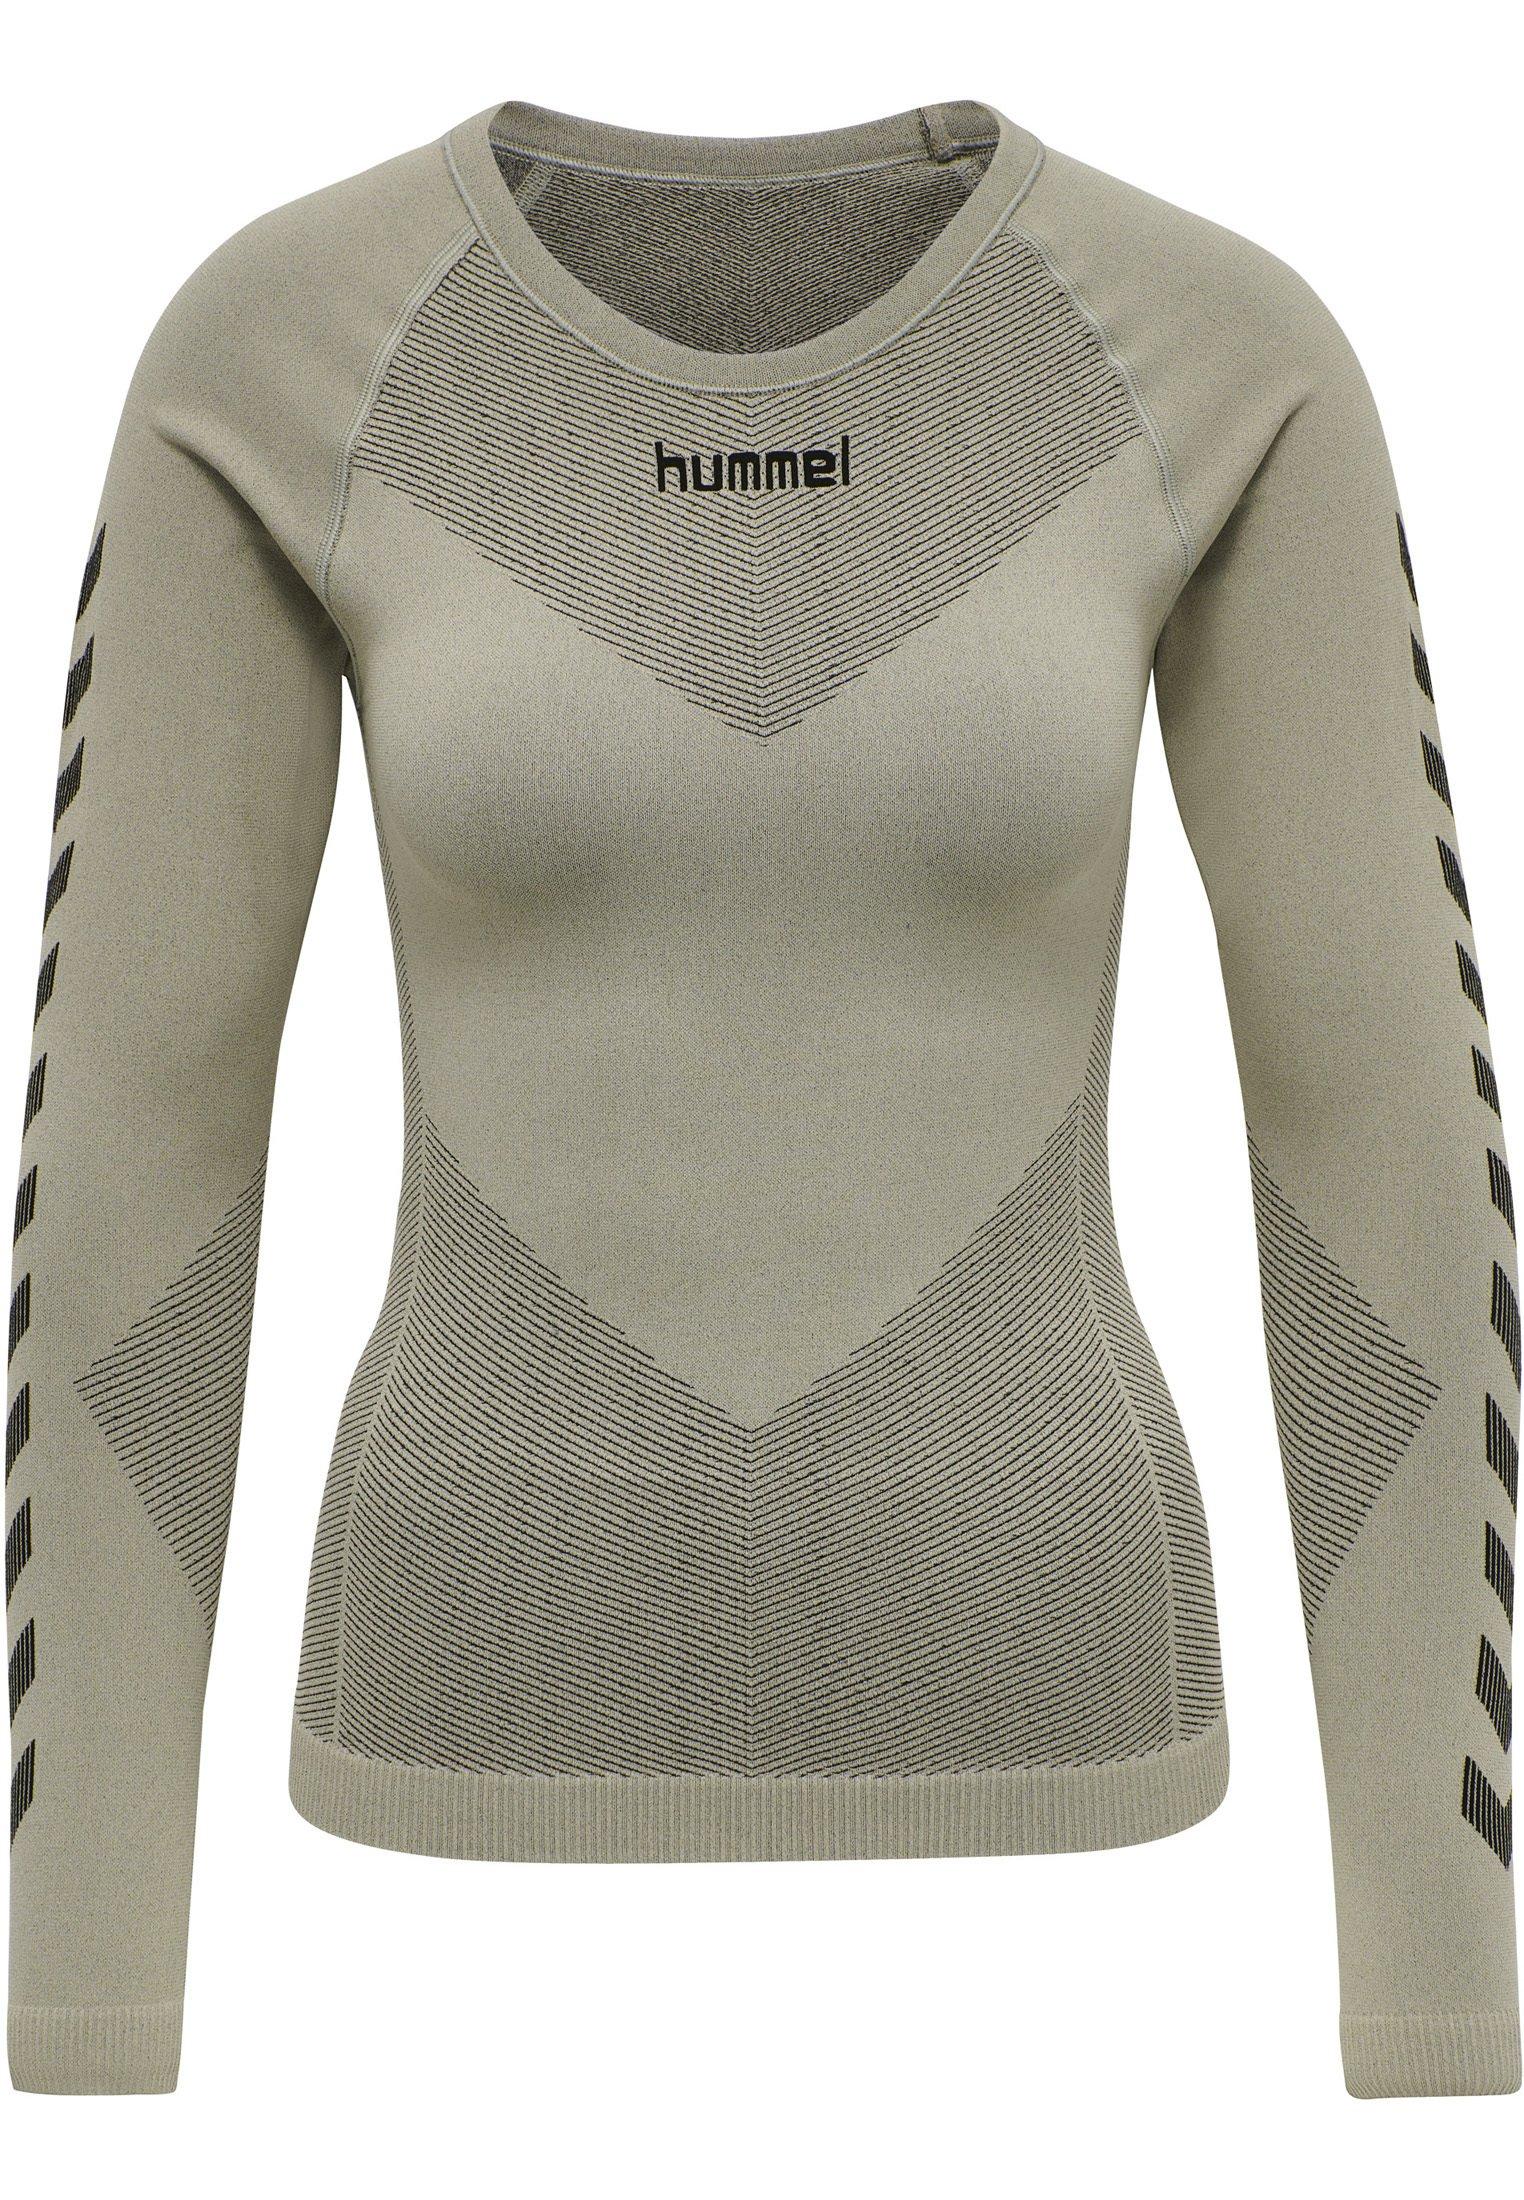 Femme FIRST SEAMLESS WOMAN - T-shirt à manches longues